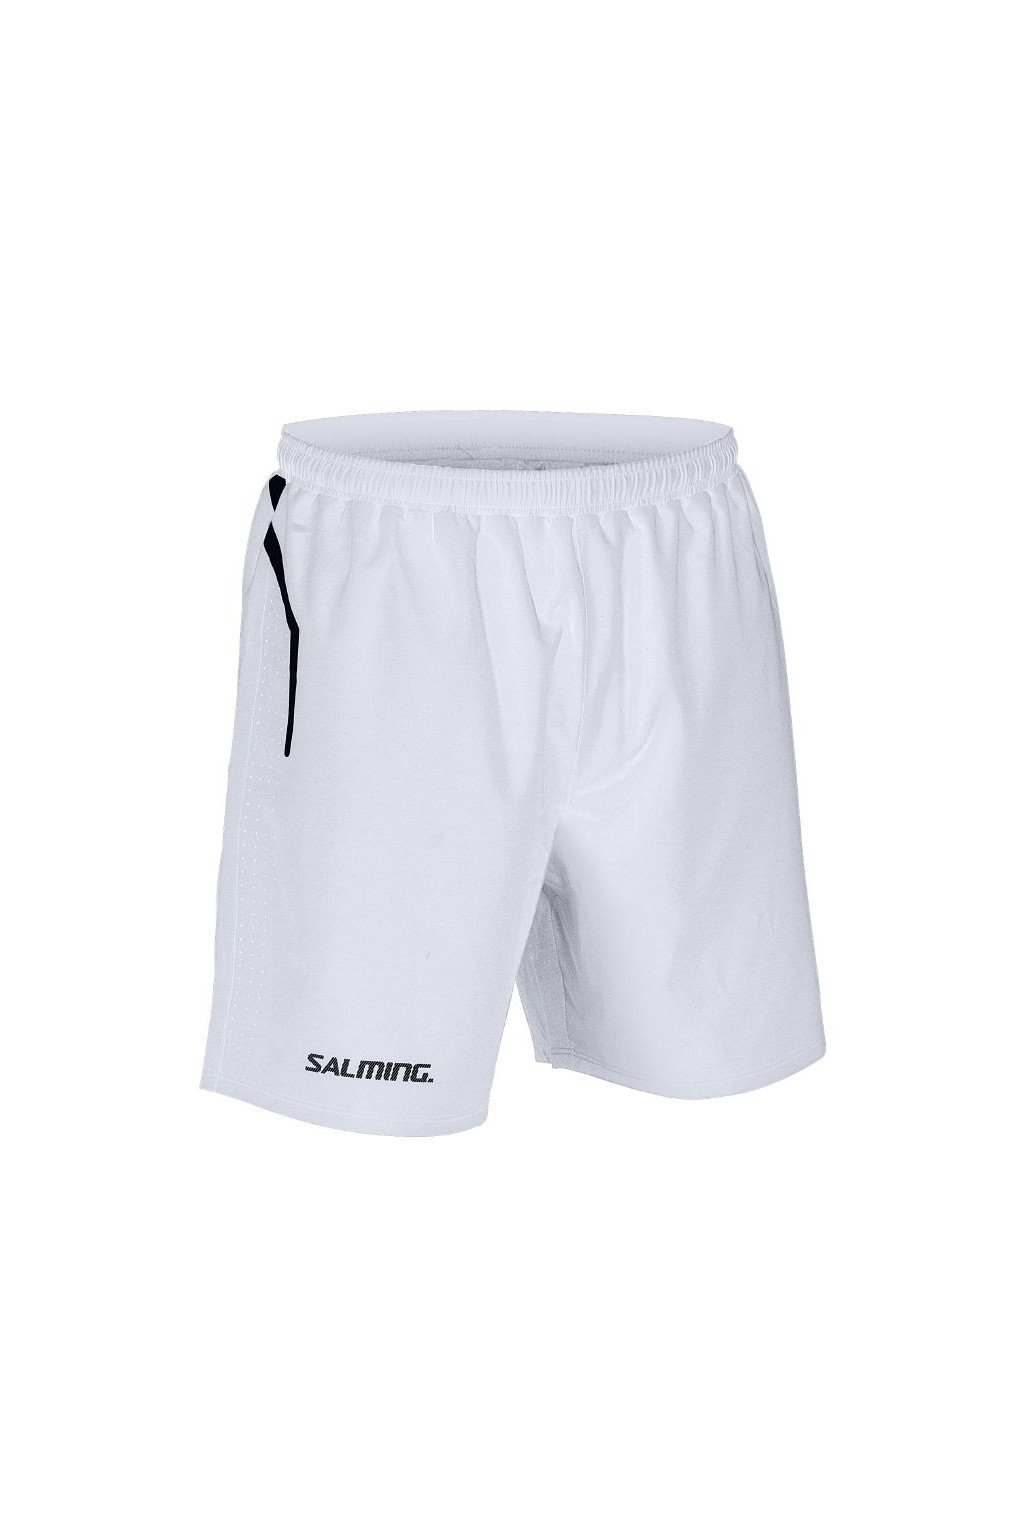 salming pro training shorts white xxl